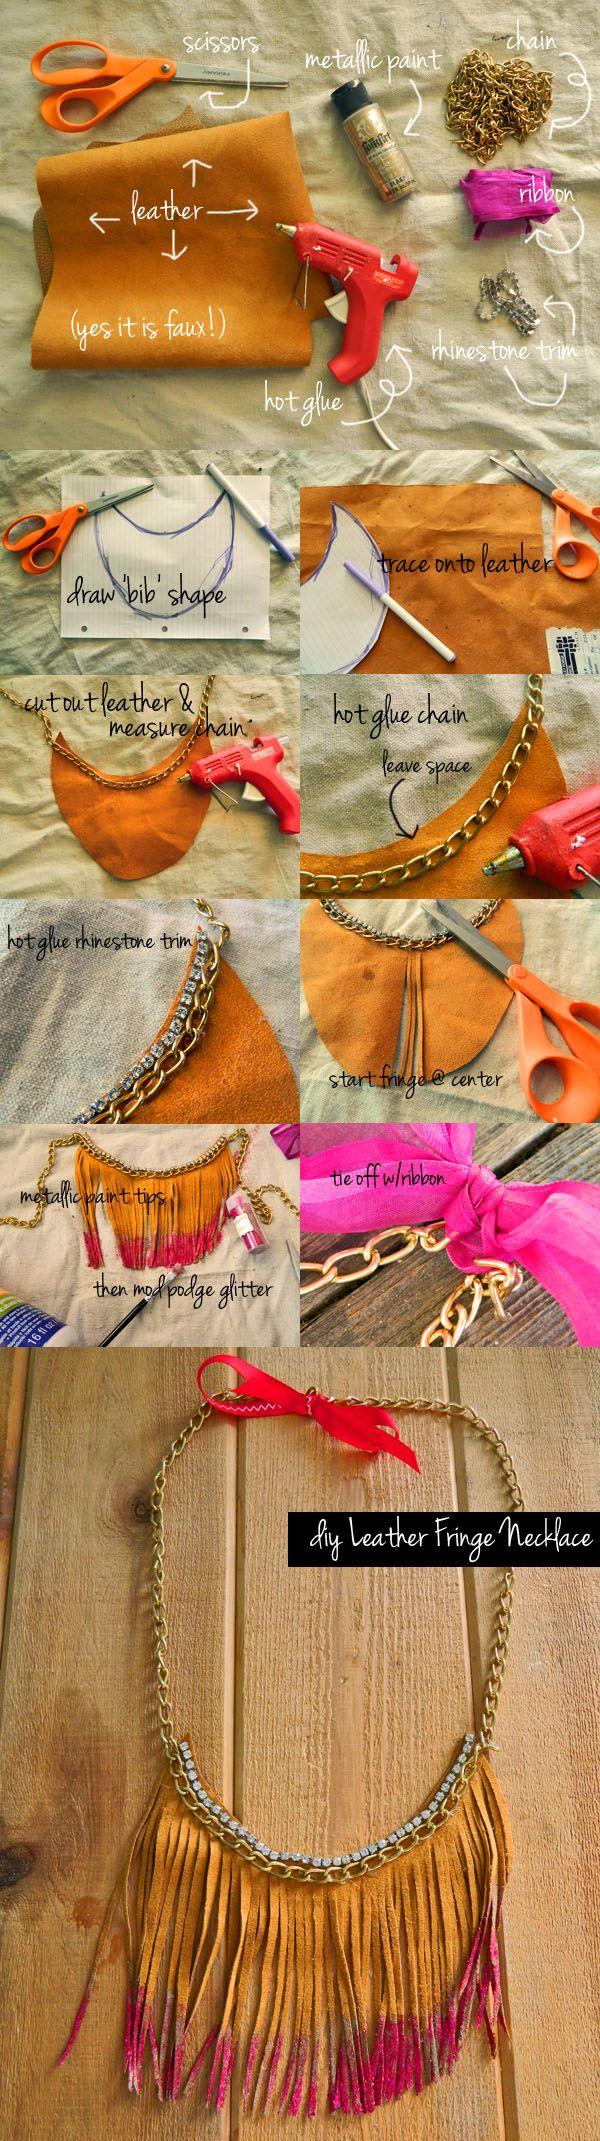 Tutorial-DIY Leather Fringe Necklace